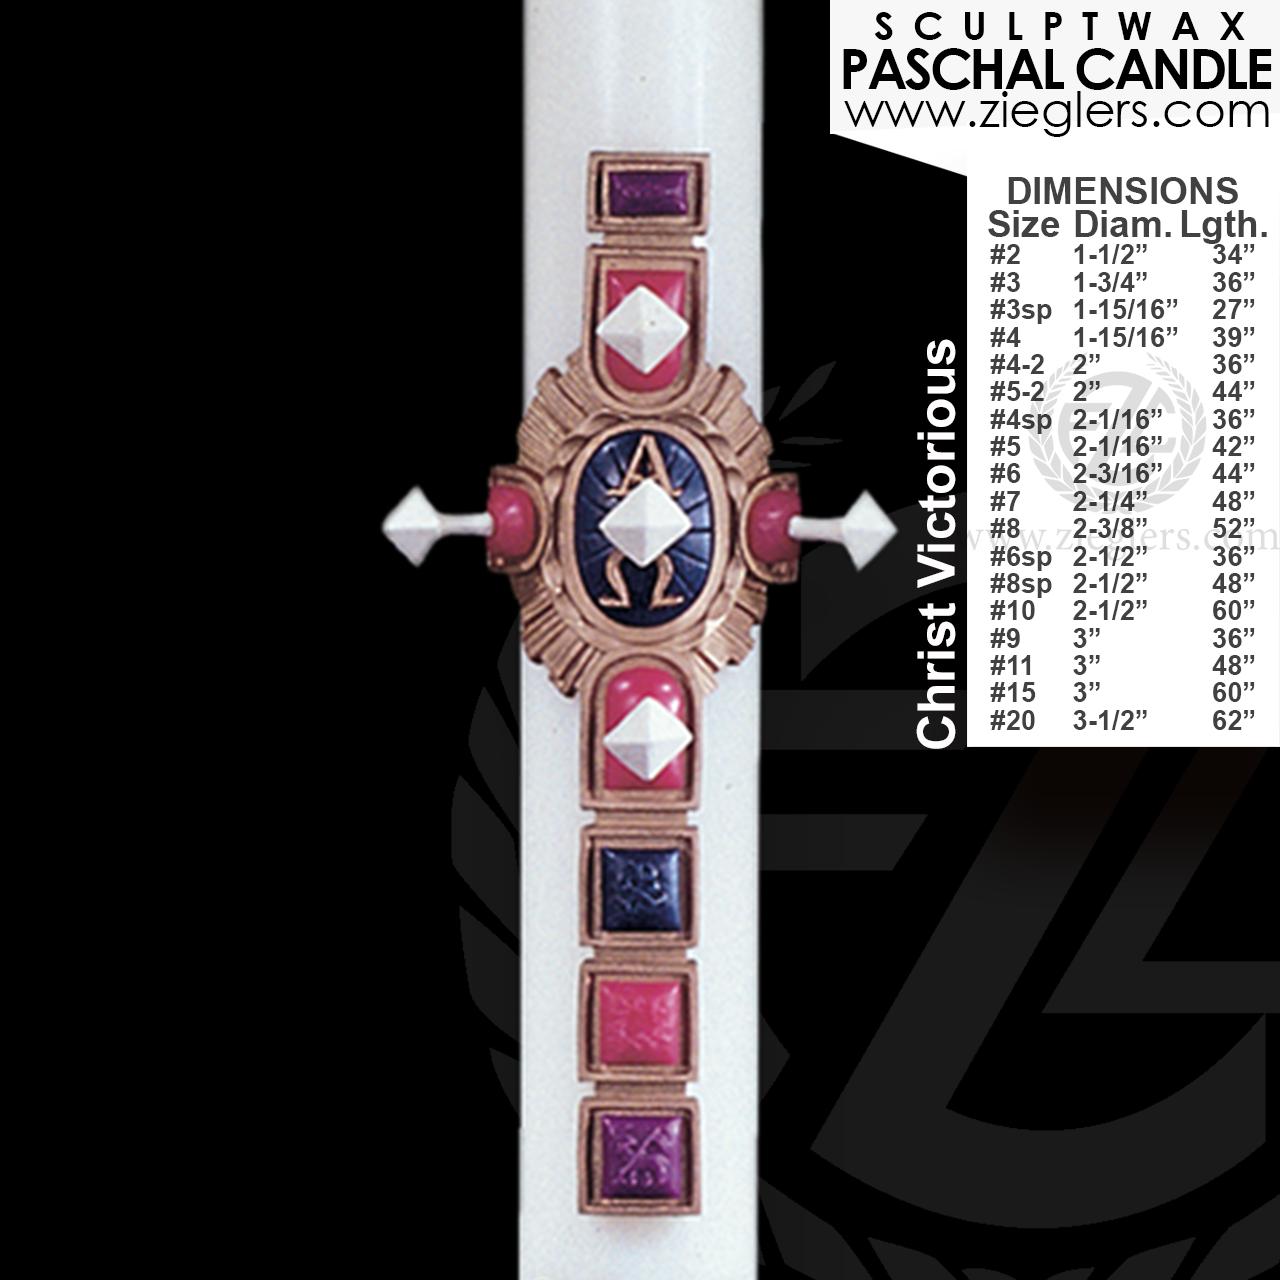 Paschal Candle Christ Victorious Sculptwax 18 Sizes Wax Cross